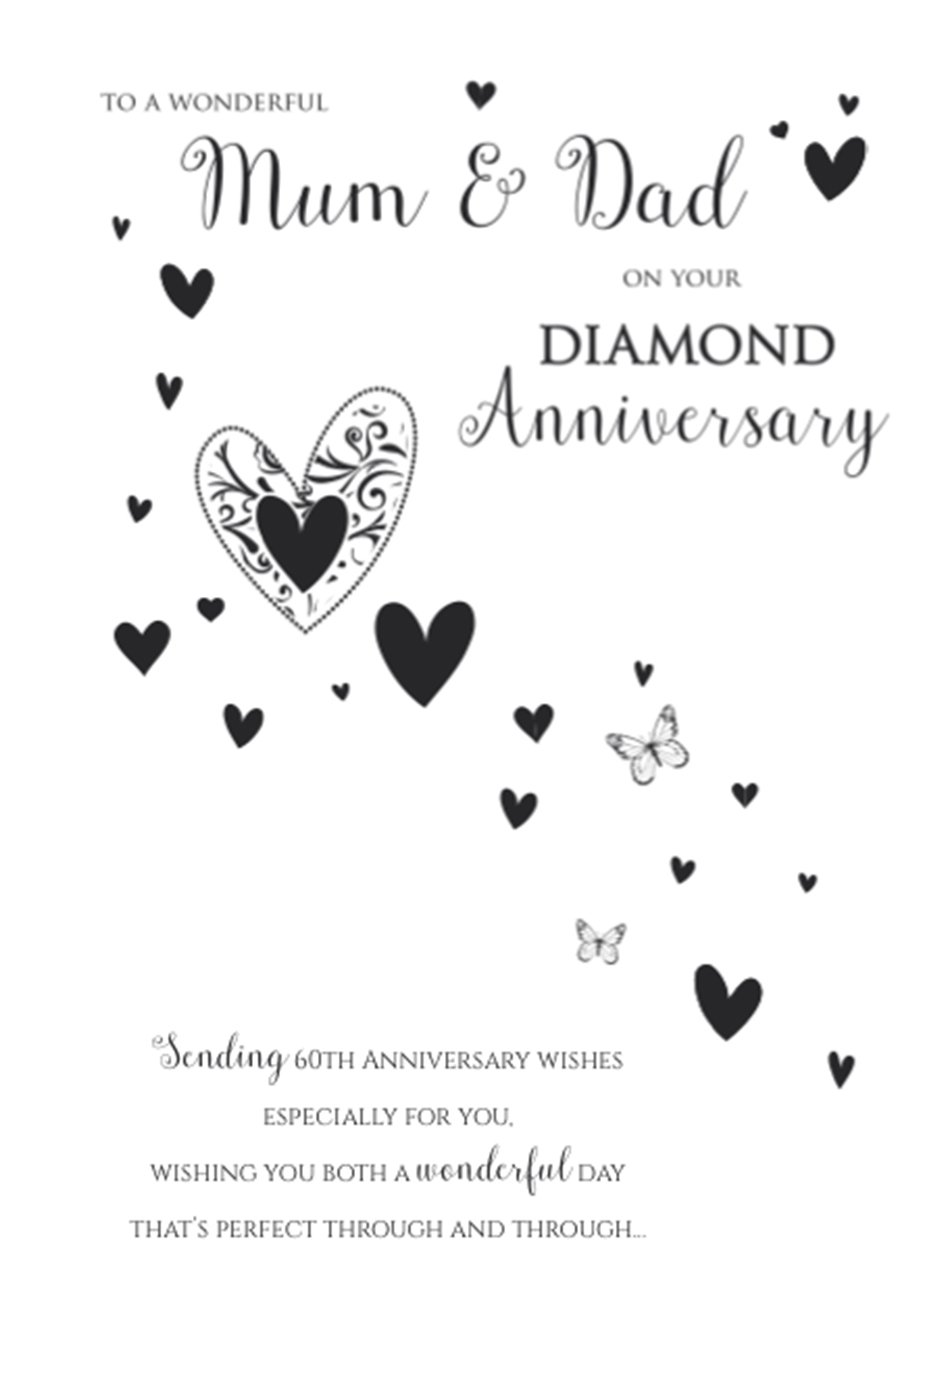 ICG Mum & Dad Diamond 60th Wedding Anniversary Card - Big Text & Hearts 9